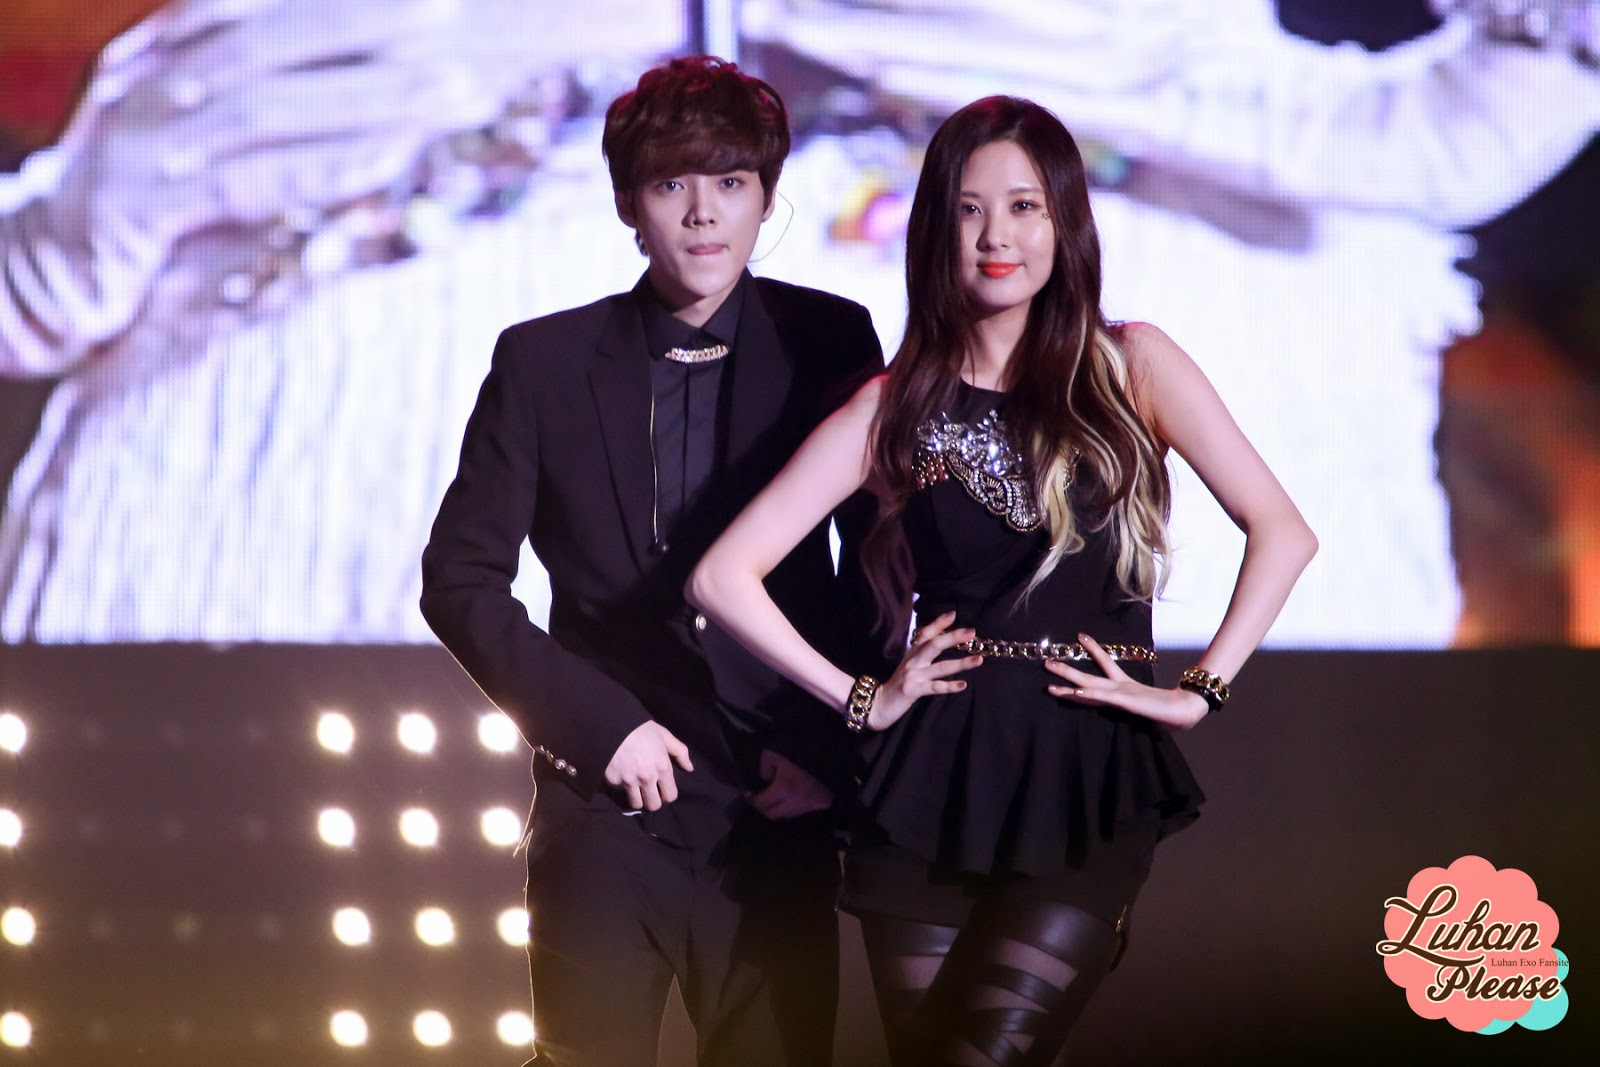 Berita Luhan Dan Seohyun Dating Dating Reform Jew